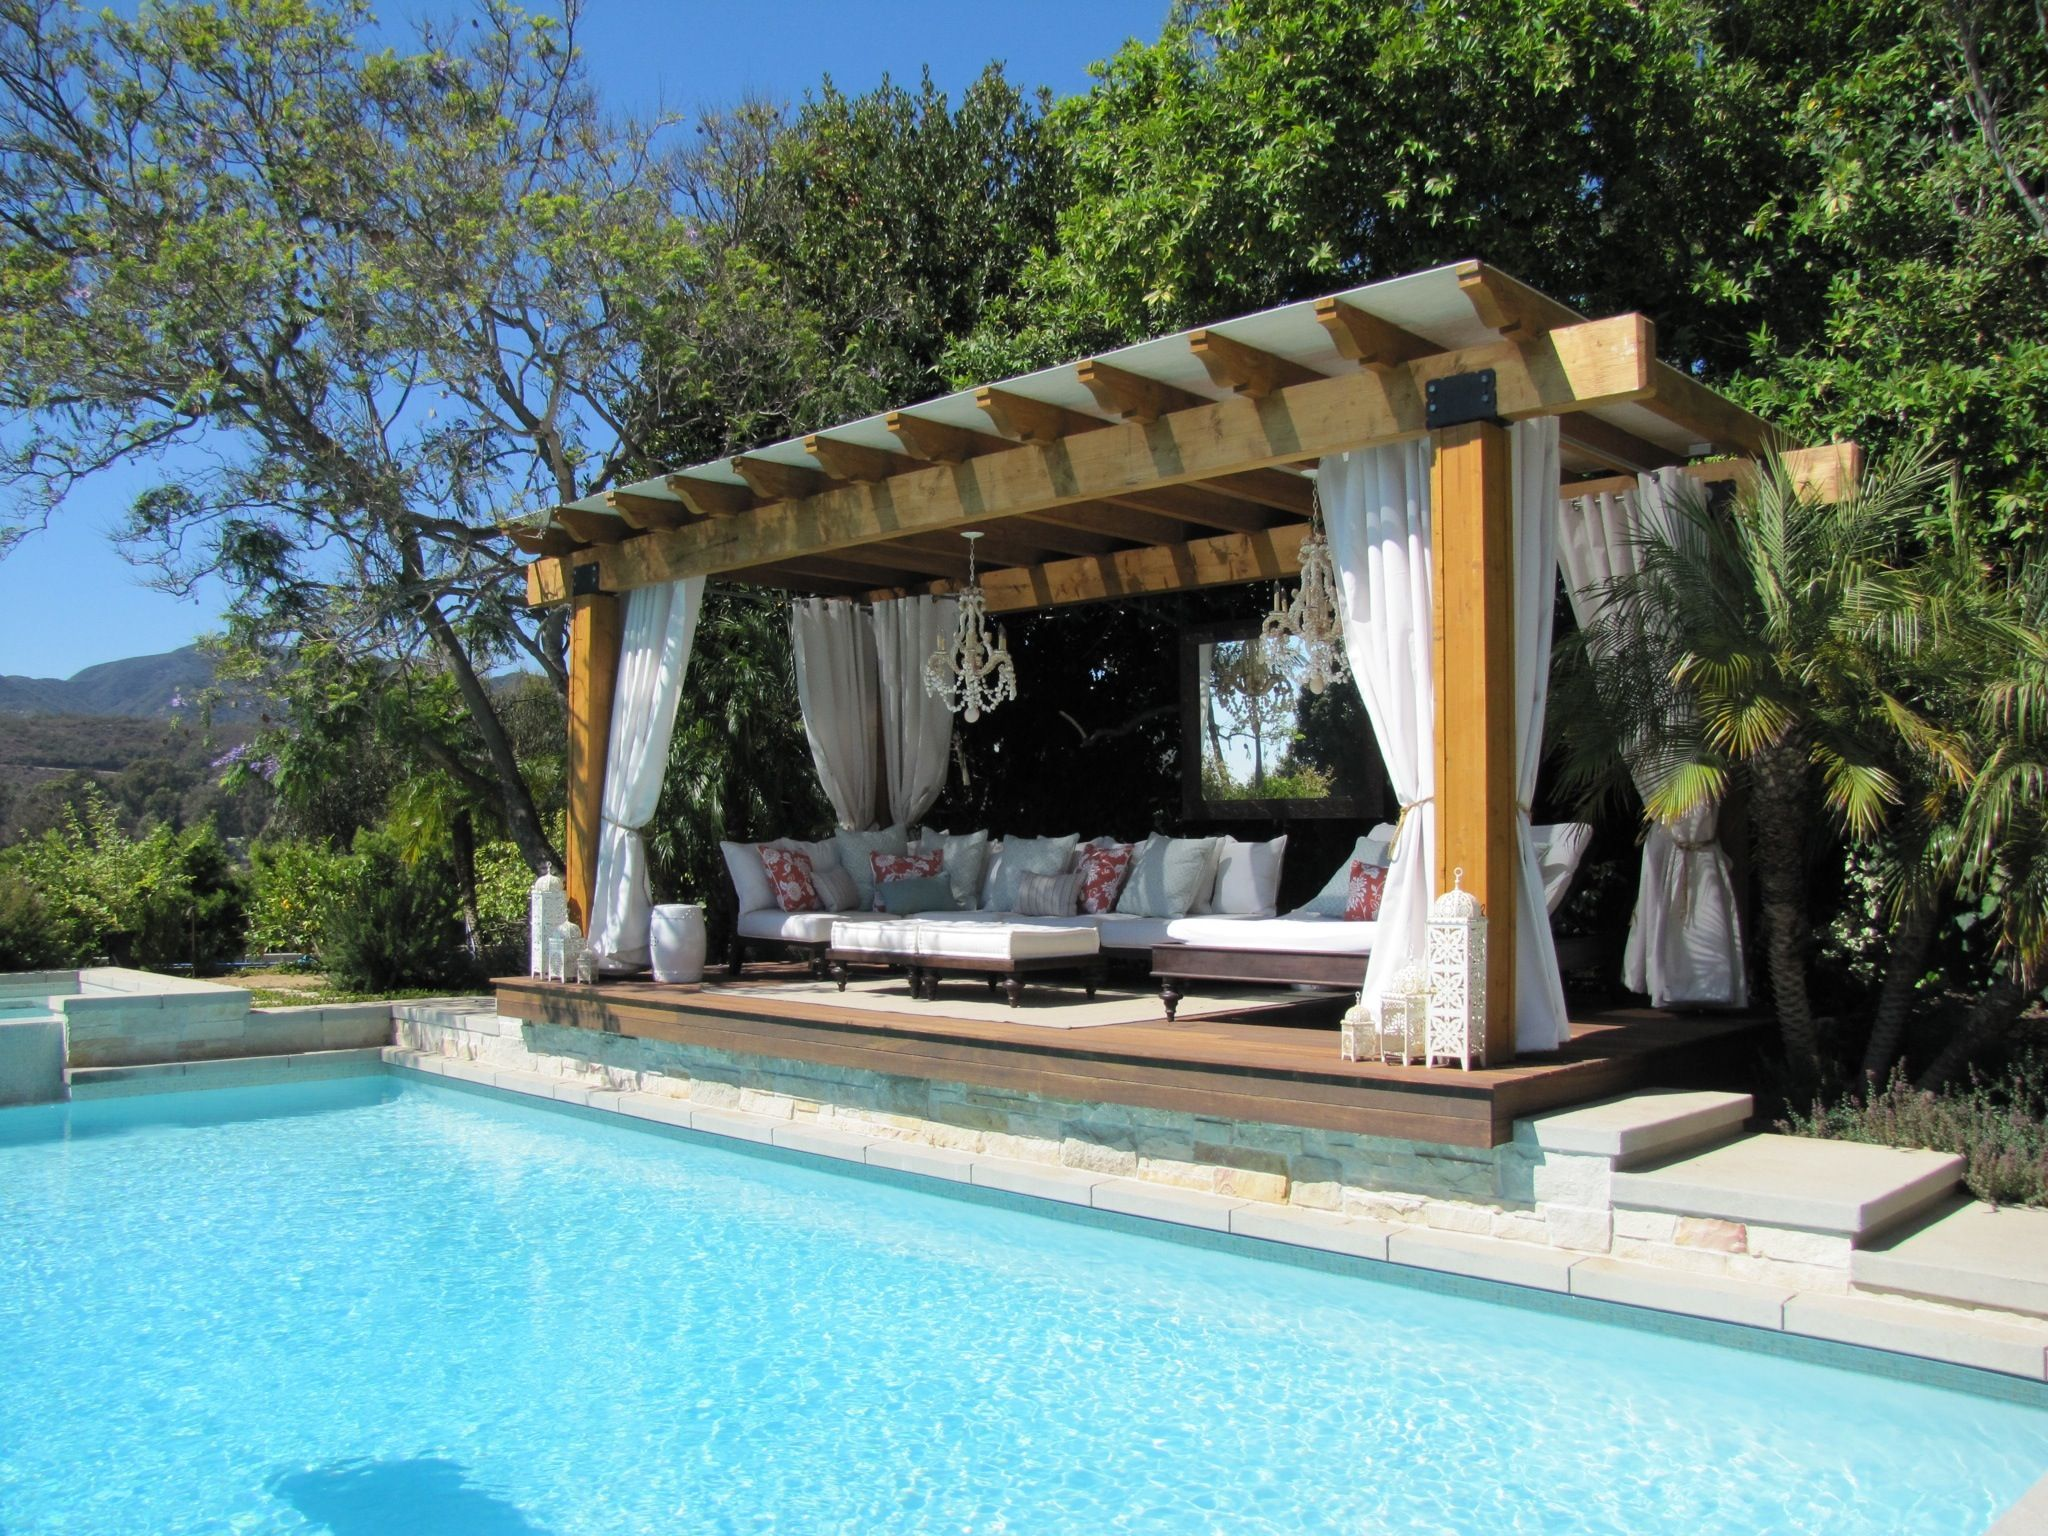 Outdoor Cabana For The Home Backyard Cabana Pool